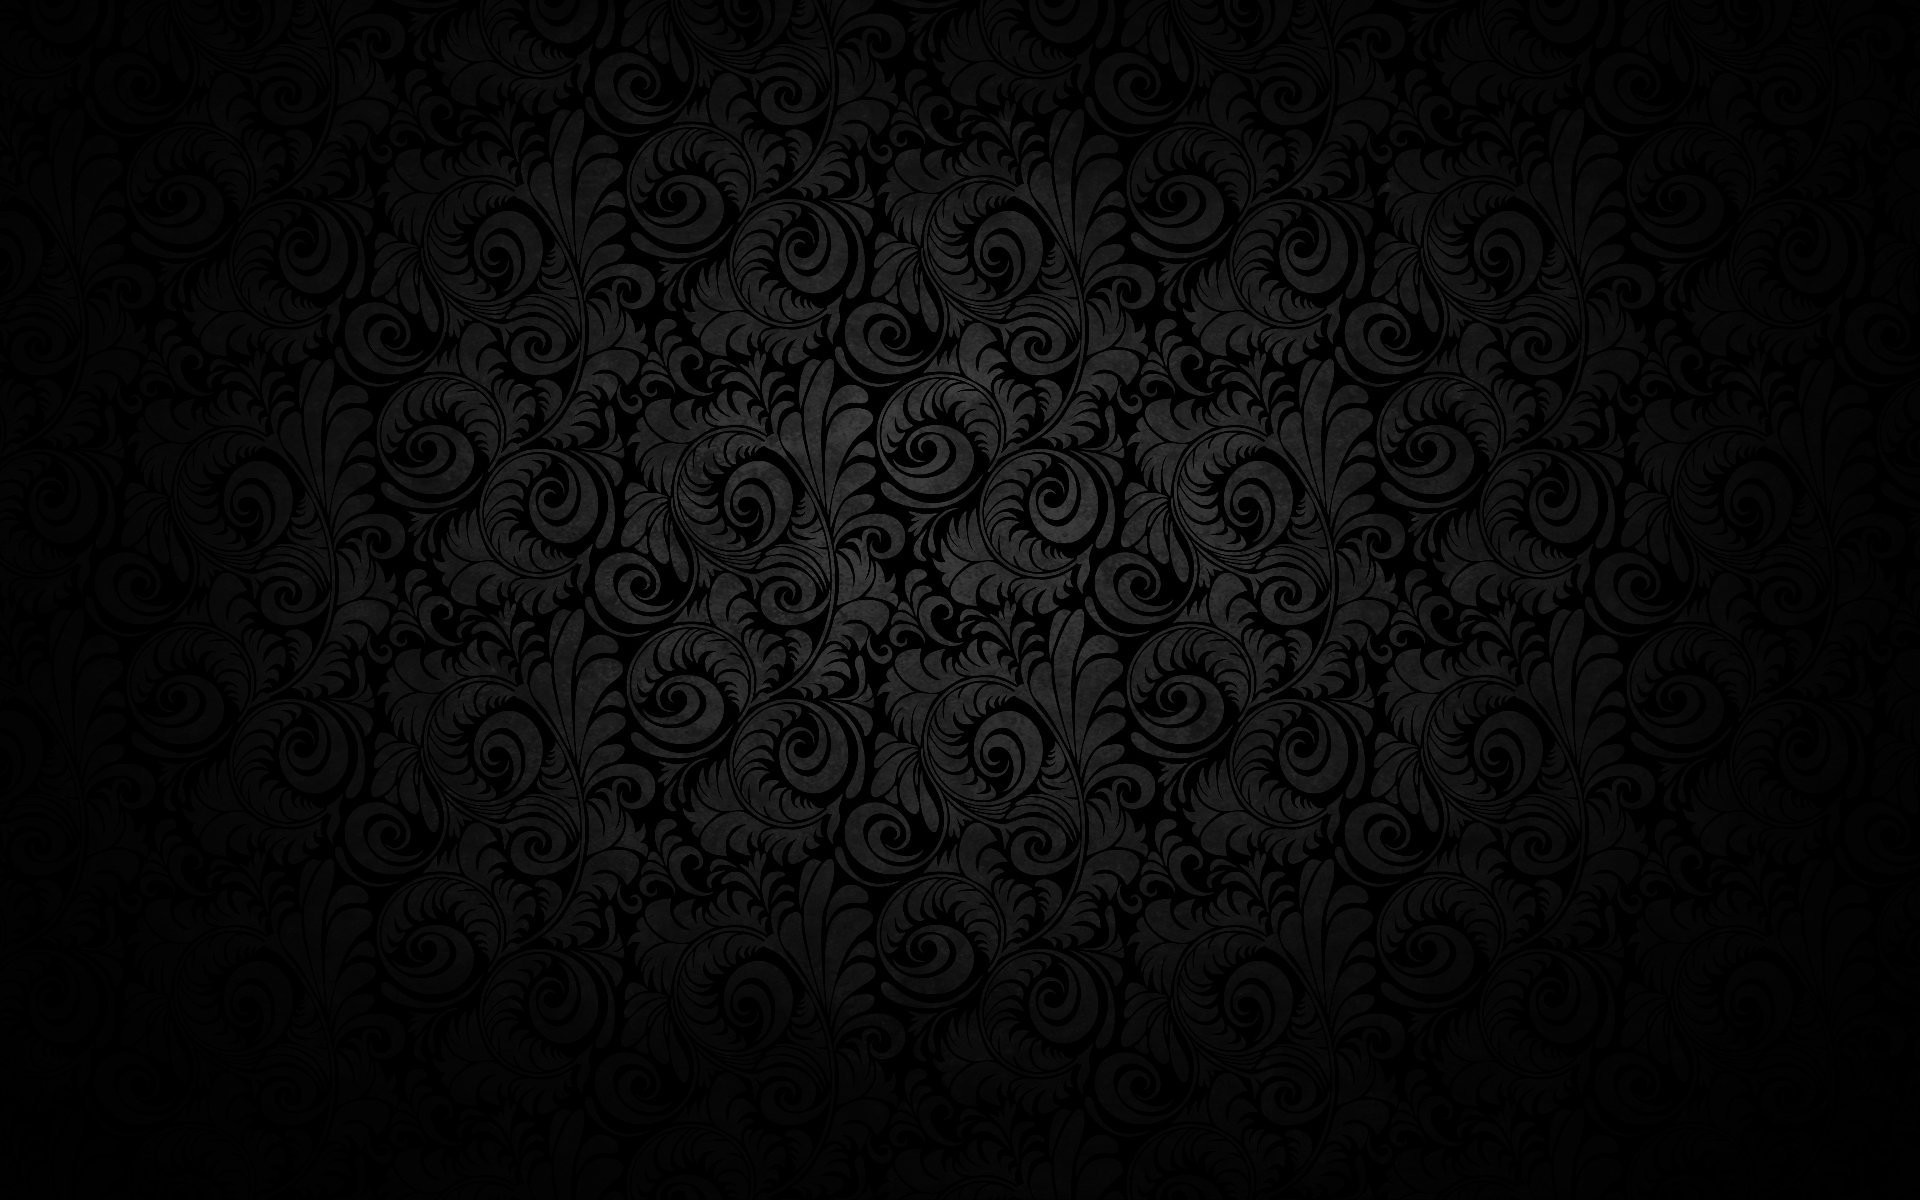 Background Cool Black : Full HD desktop wallpaper : Wallinda